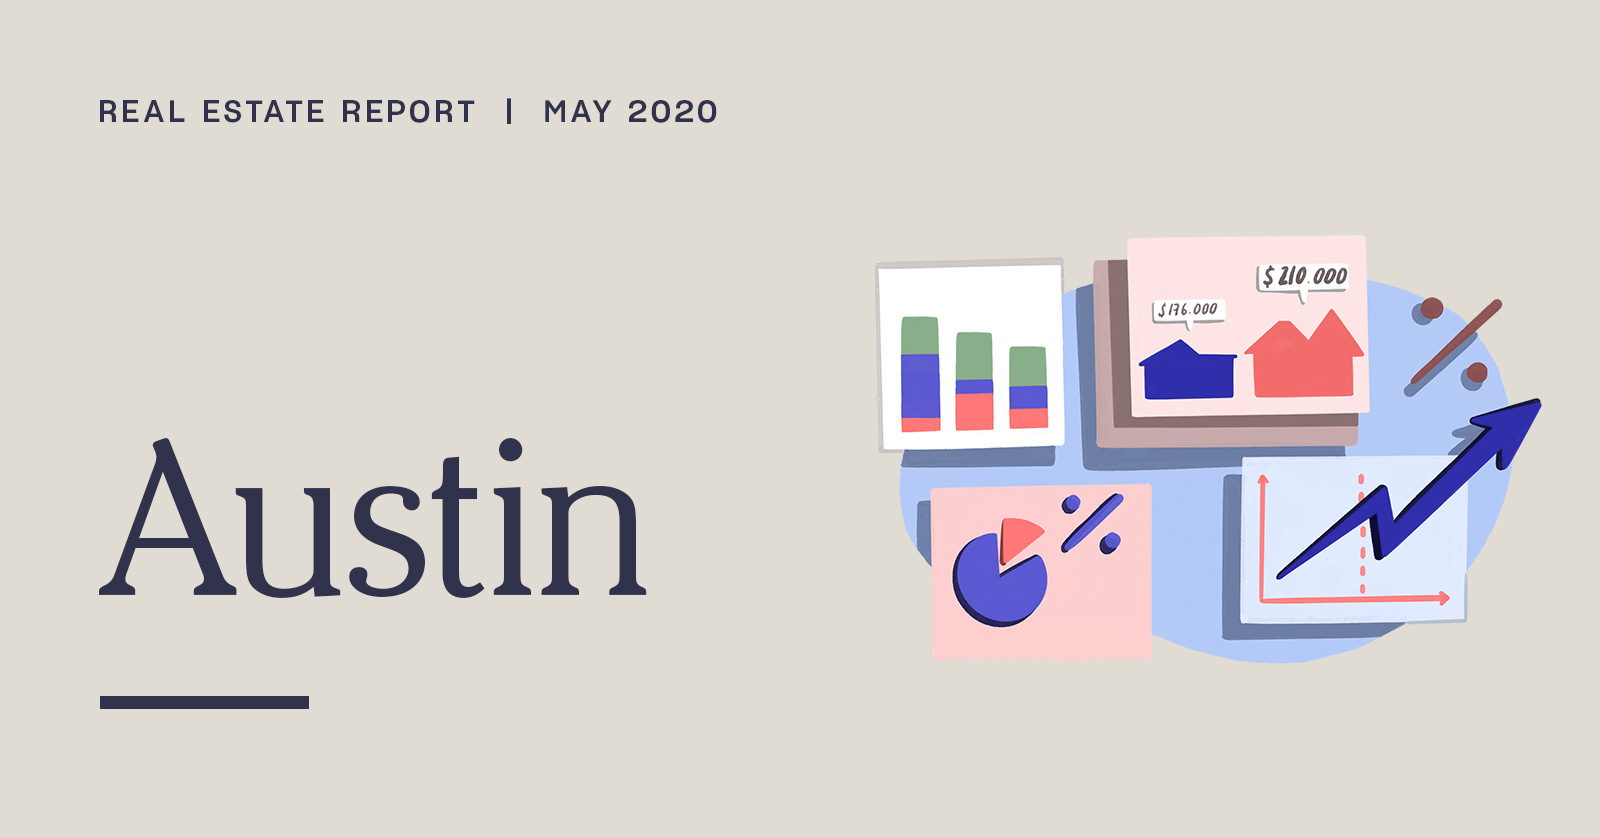 Austin Real Estate Report | May 2020